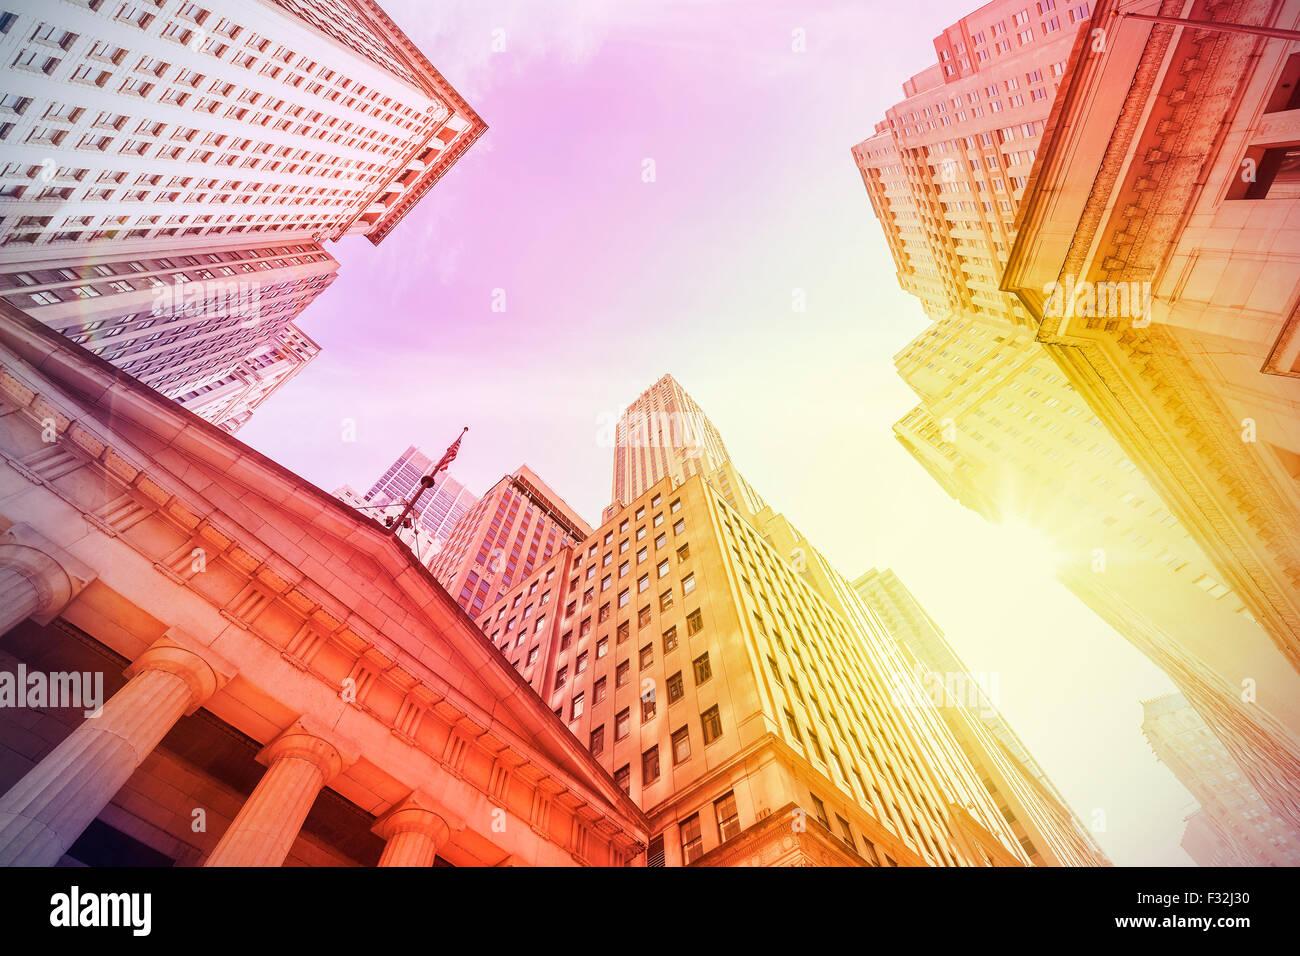 Vintage Instagram gefiltert Wall Street bei Sonnenuntergang, Manhattan, New York City, USA. Stockbild